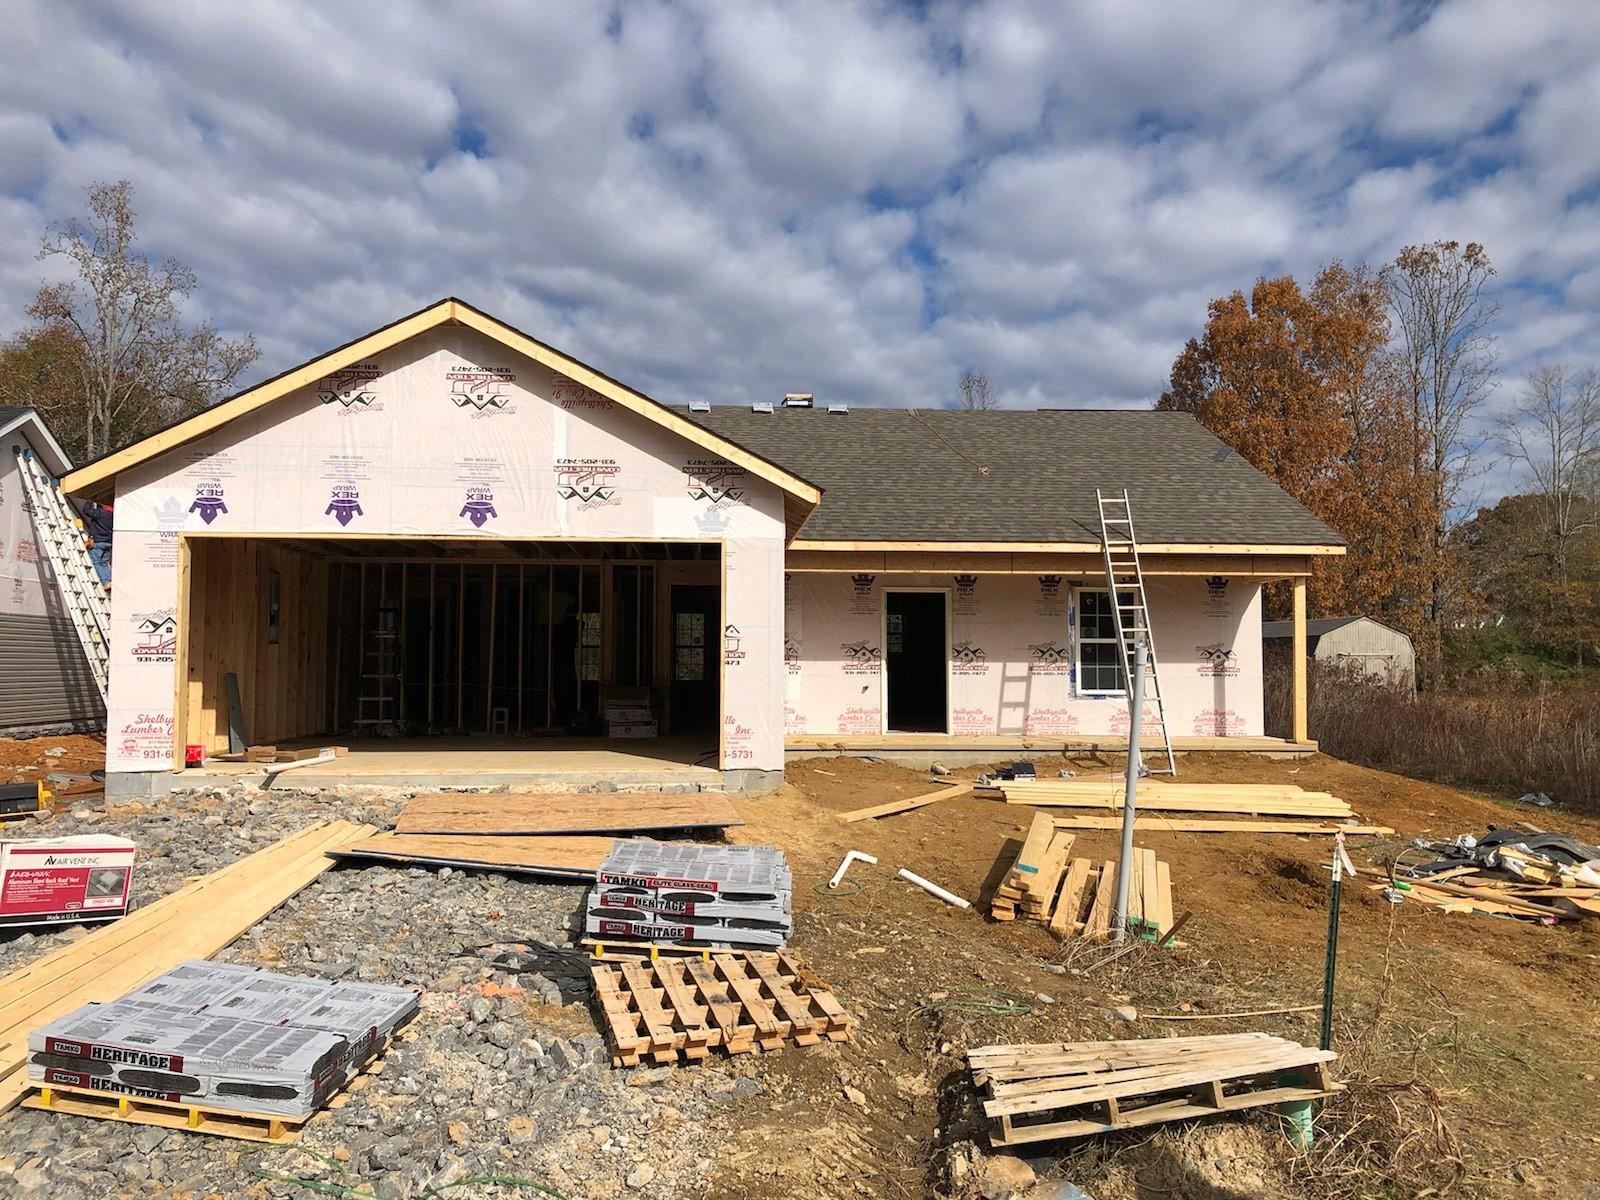 100 Collinwood Dr, Tullahoma, TN 37388 - Tullahoma, TN real estate listing